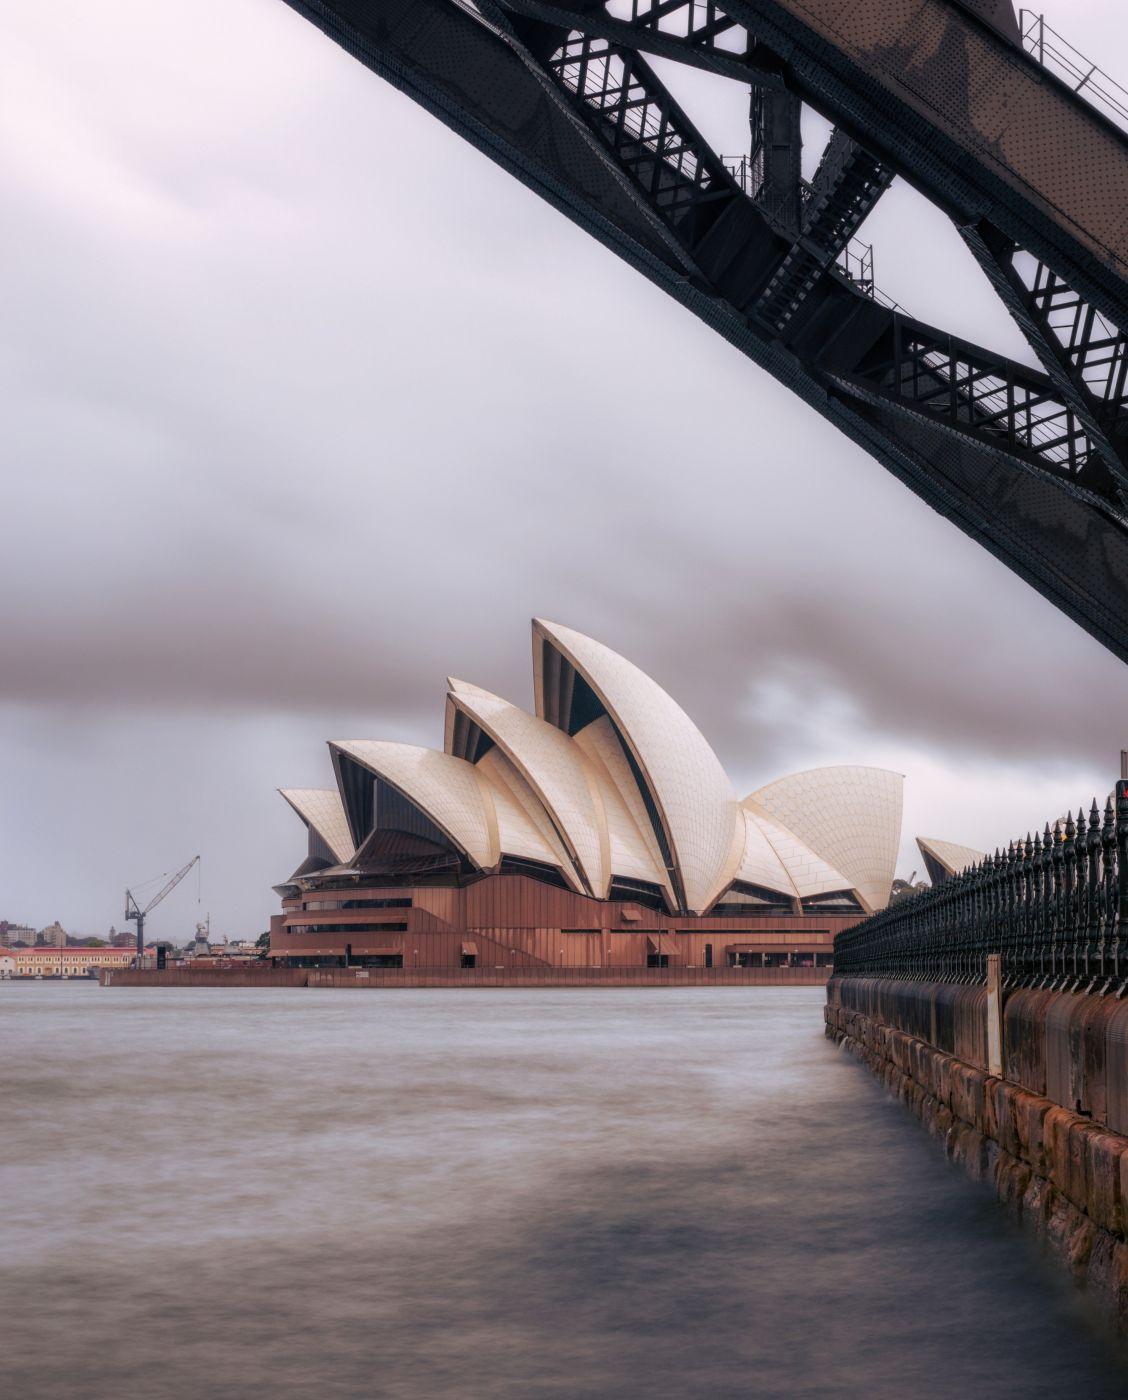 Ives Step Wharf, Australia